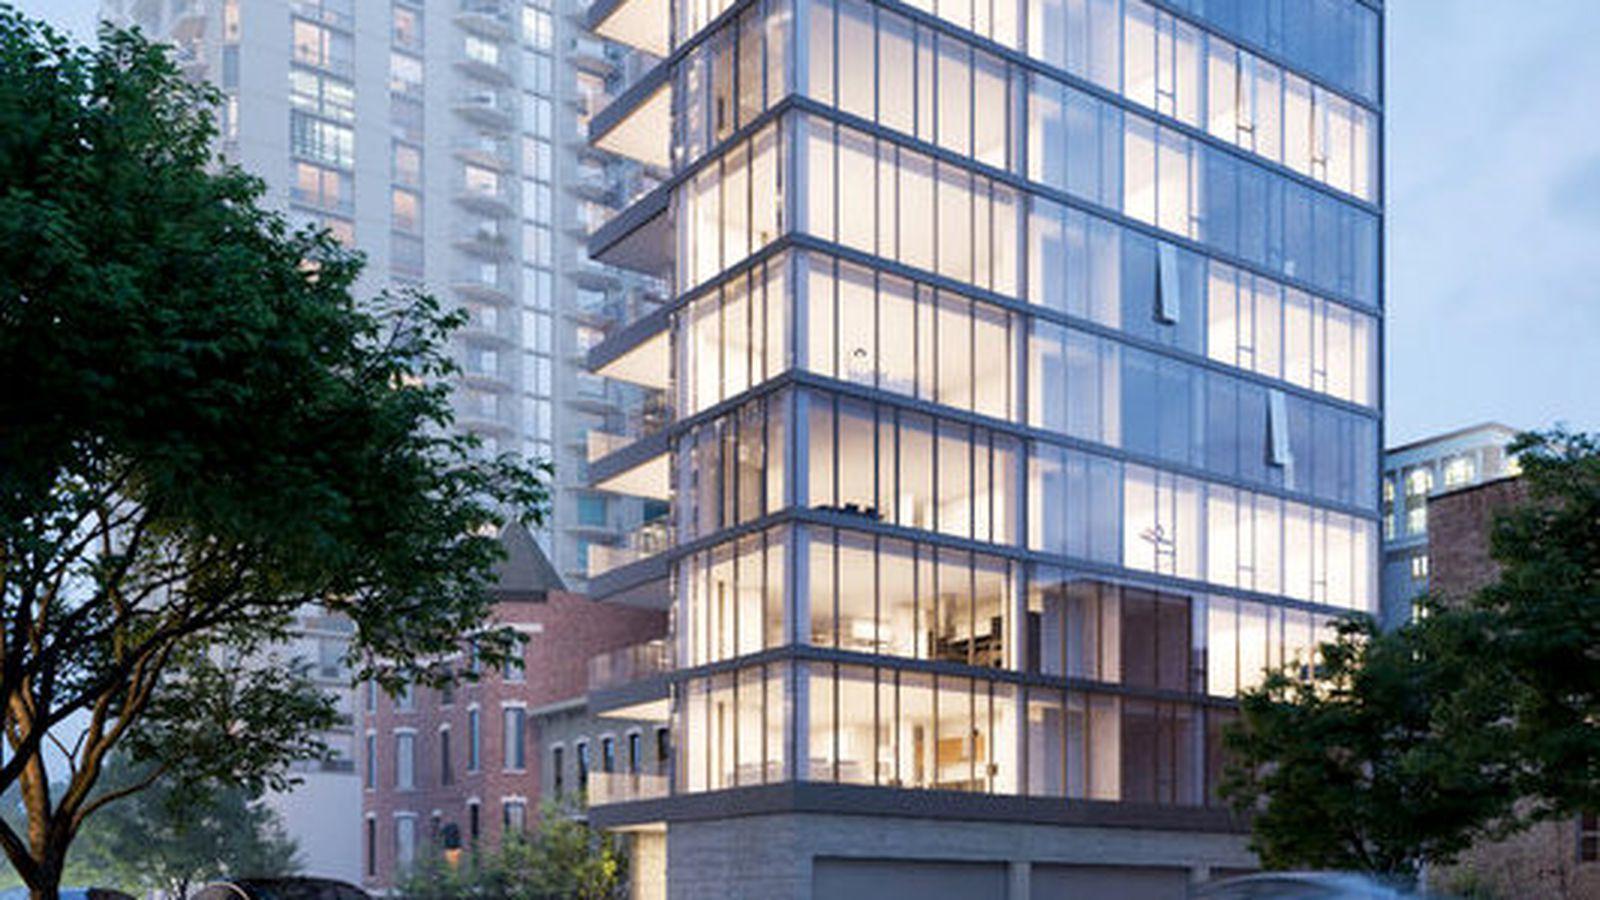 Renderings Reveal 13 Story River North Condo Development